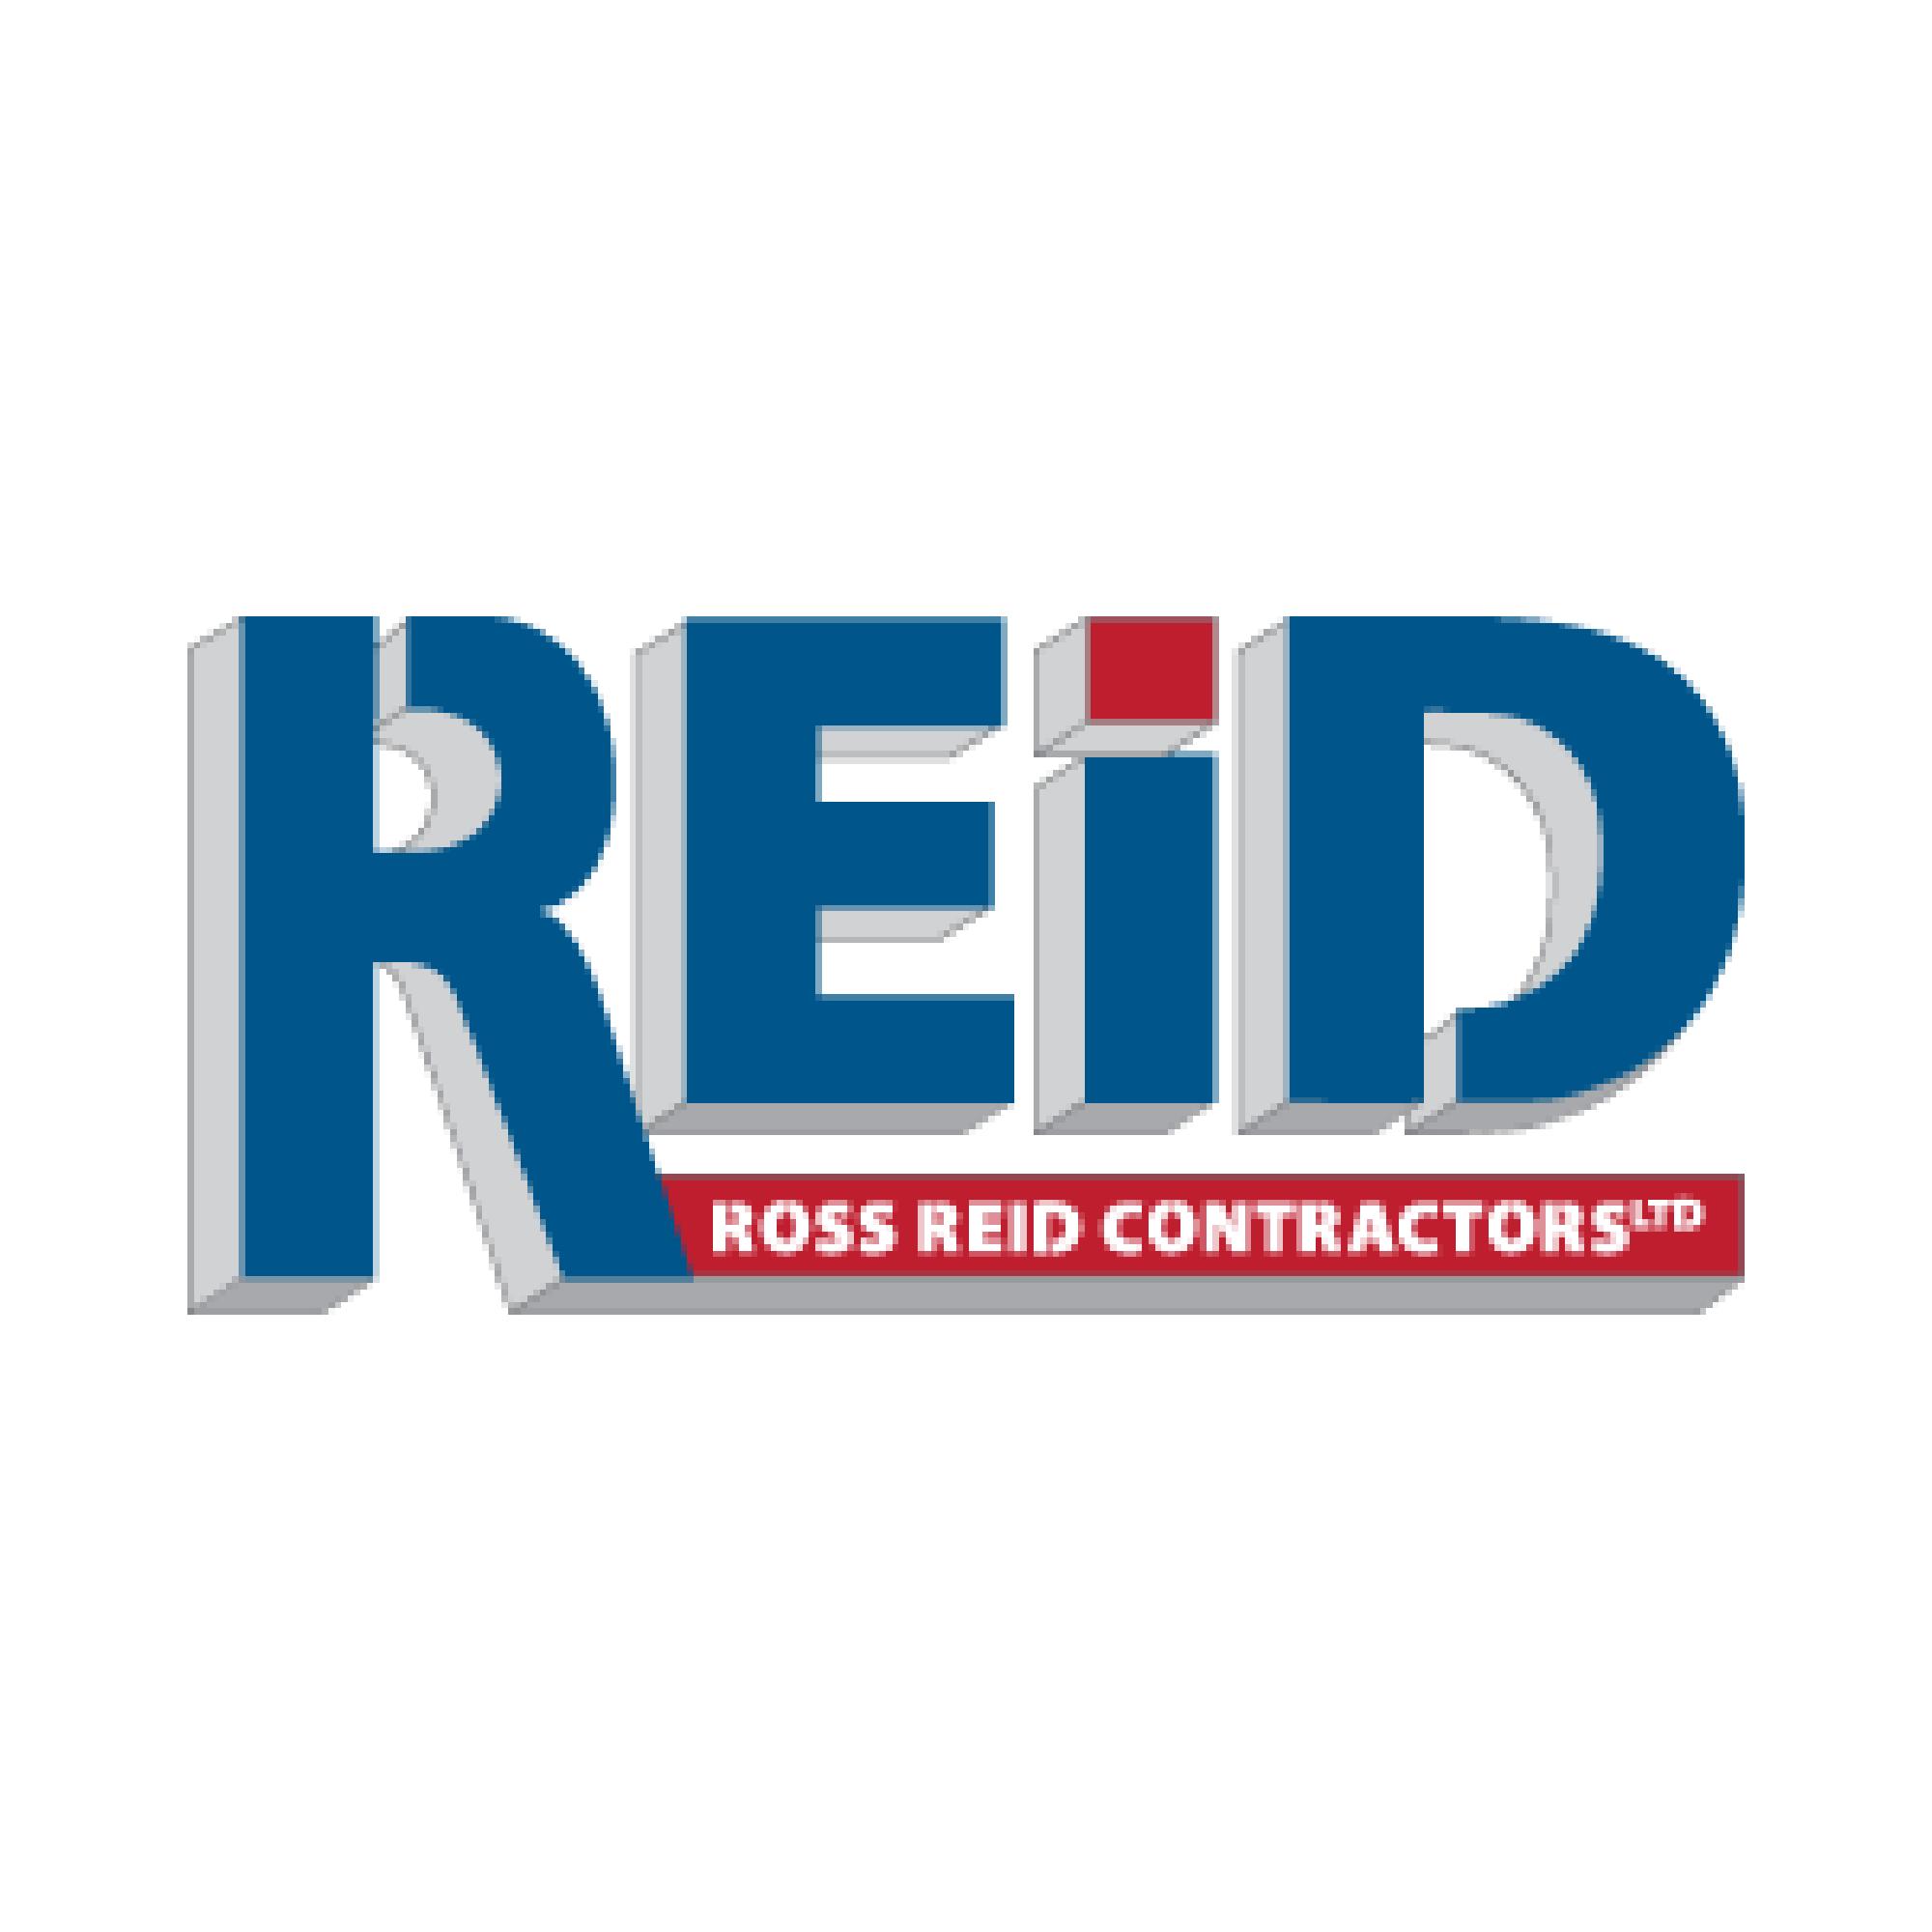 Ross Reid Using Fleet Agent